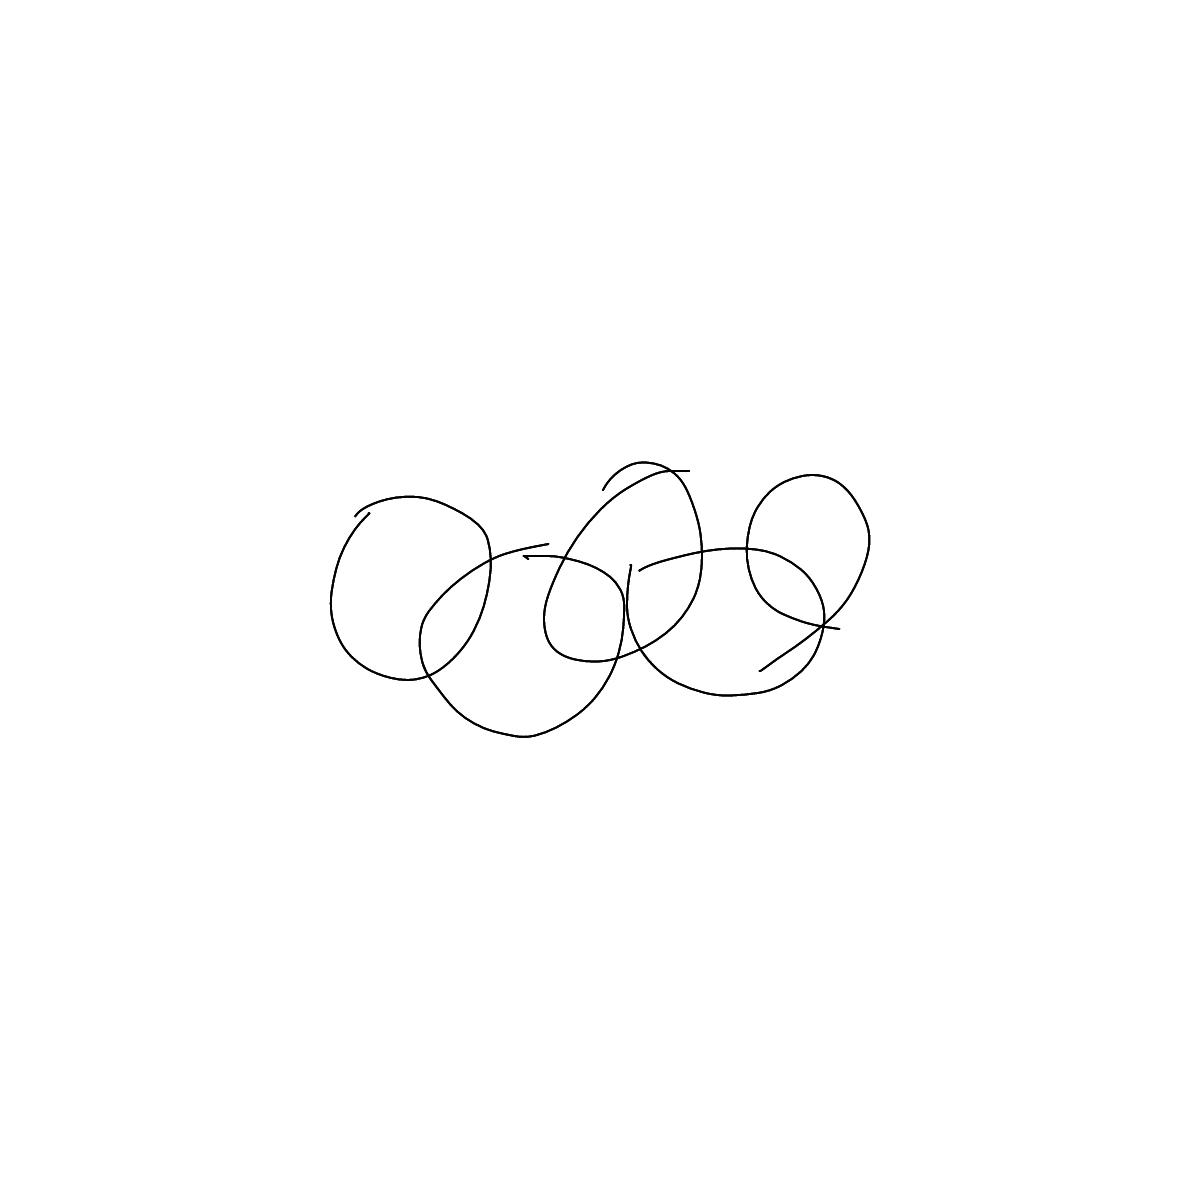 BAAAM drawing#22339 lat:-22.9110126495361330lng: -43.2093811035156250